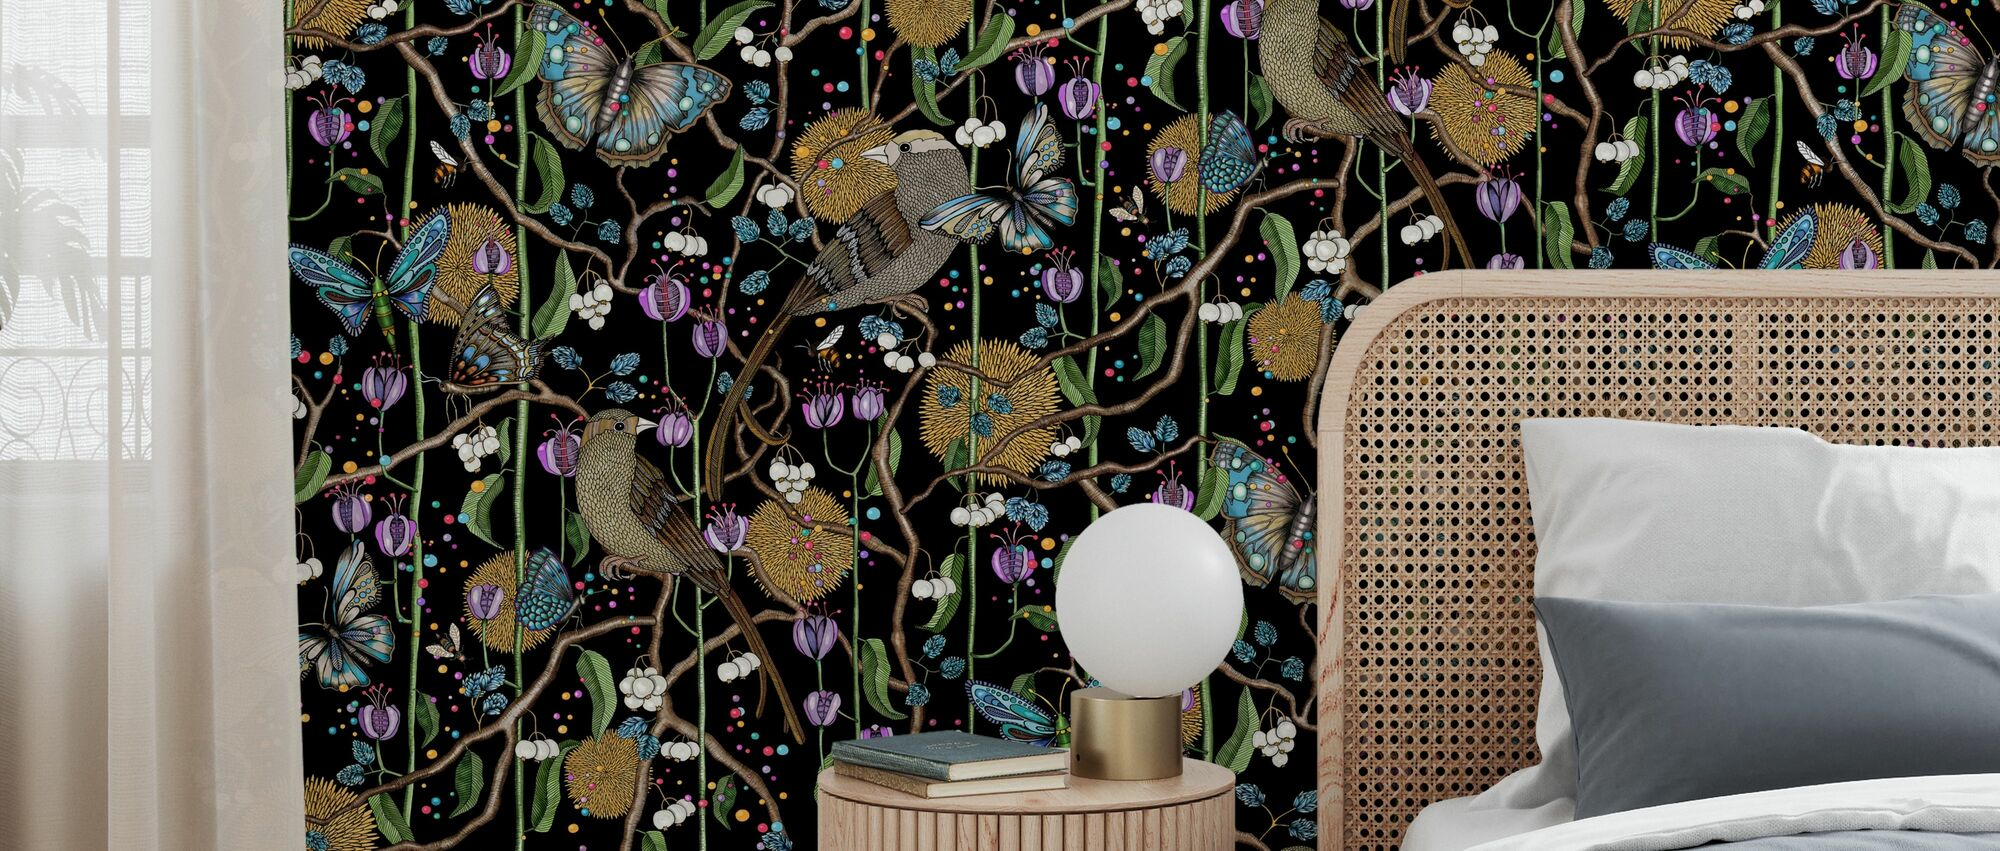 Bubblegum fugl svart - Tapet - Soverom